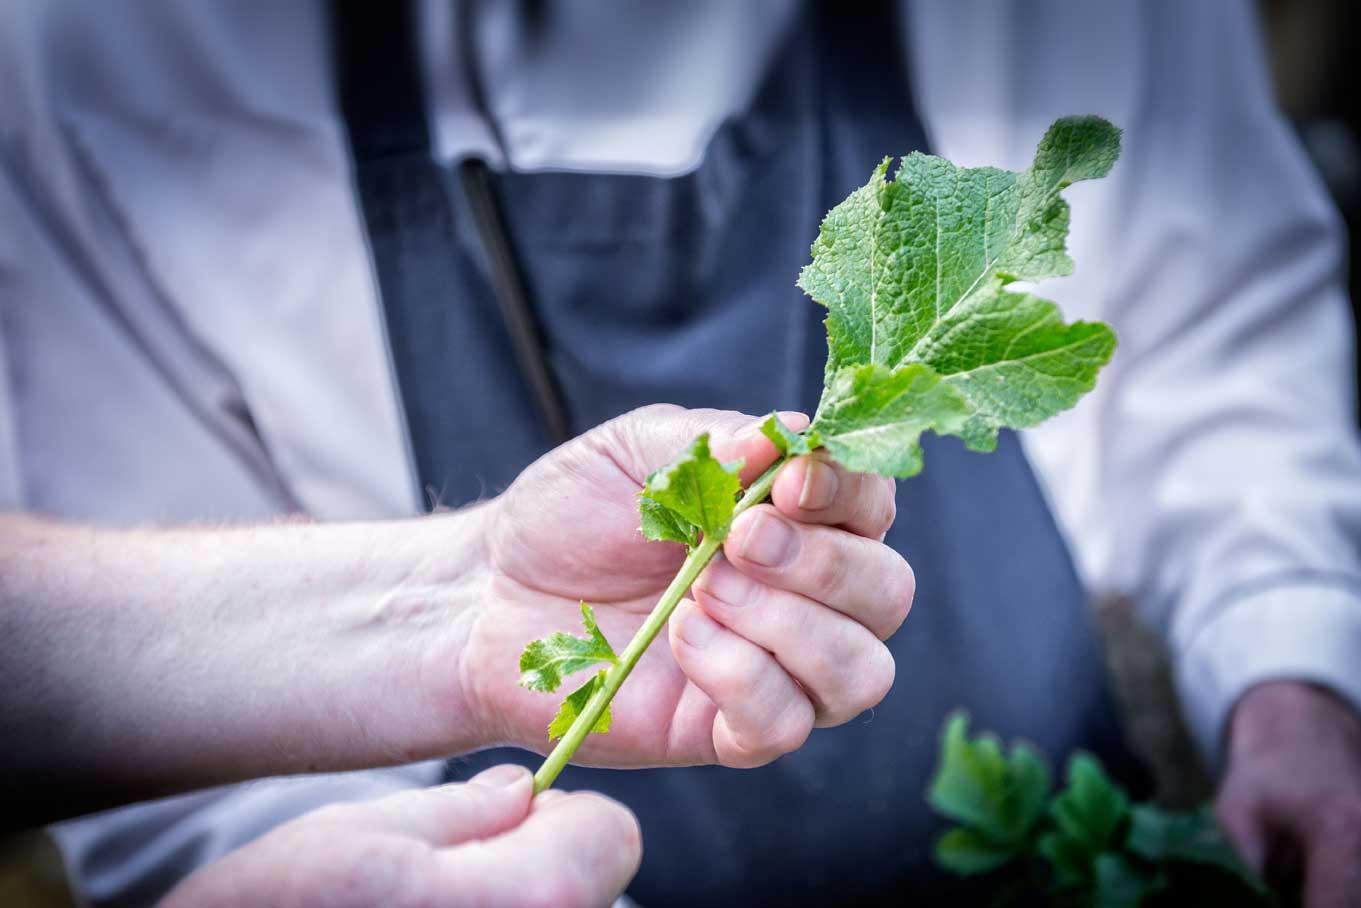 Guests enjoying The Whitebrook hospitality